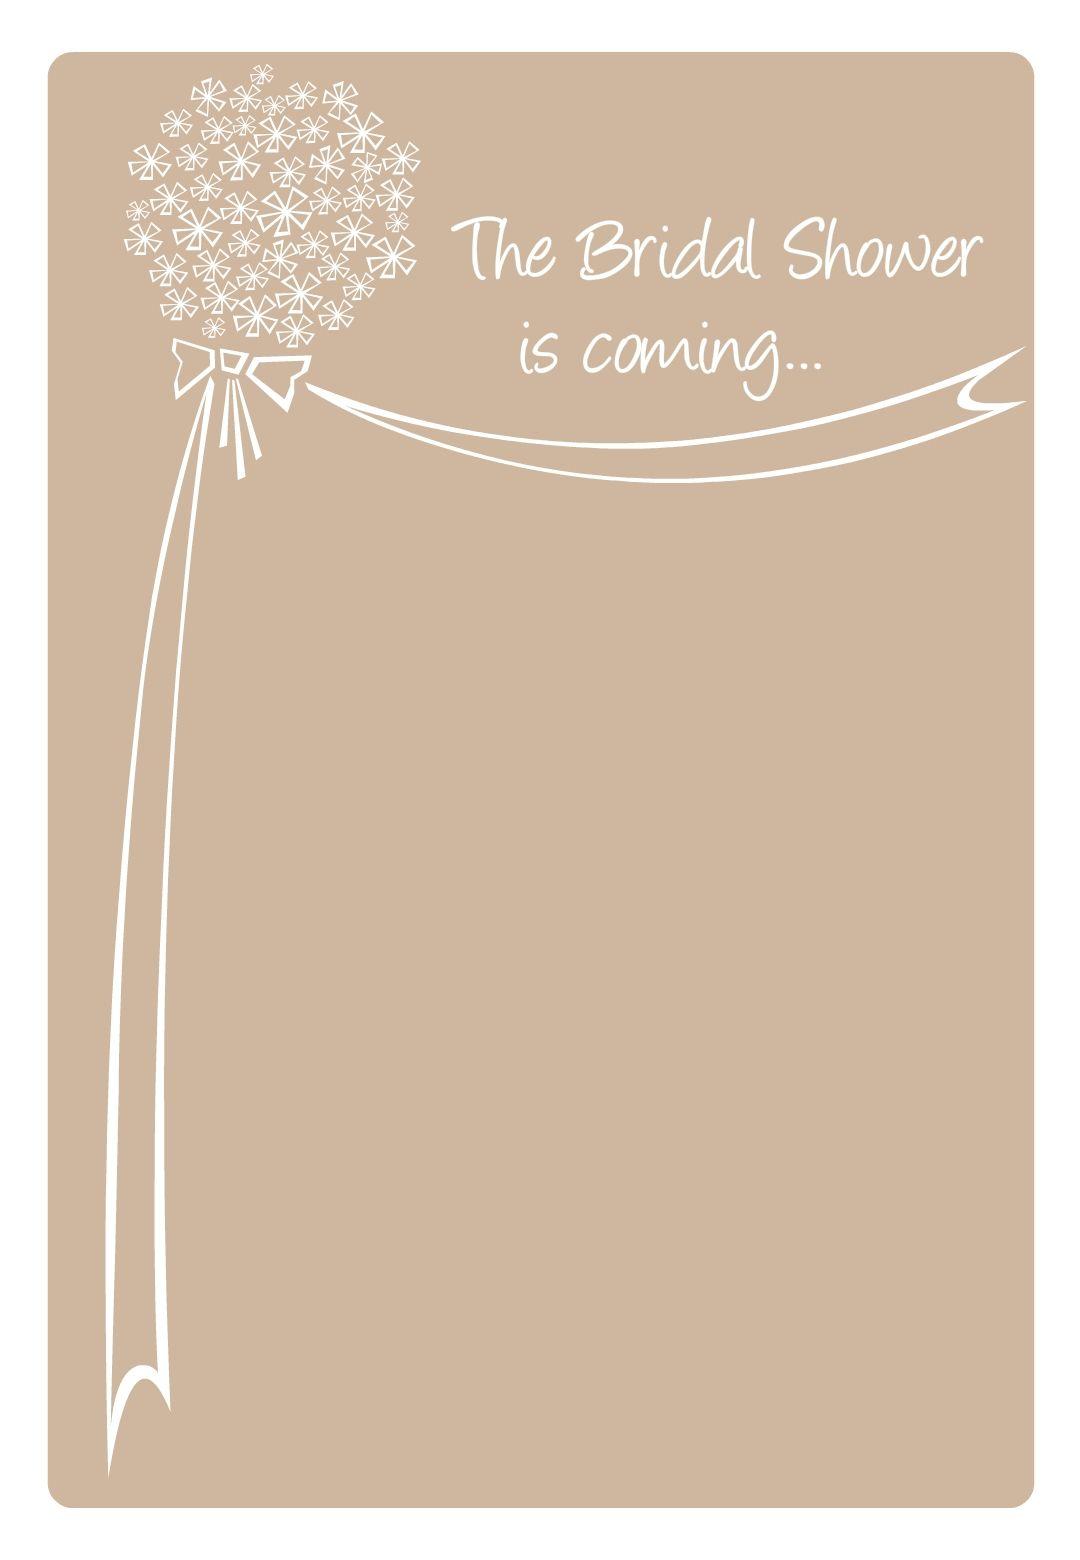 free printable bridal shower is coming invitation | free printables